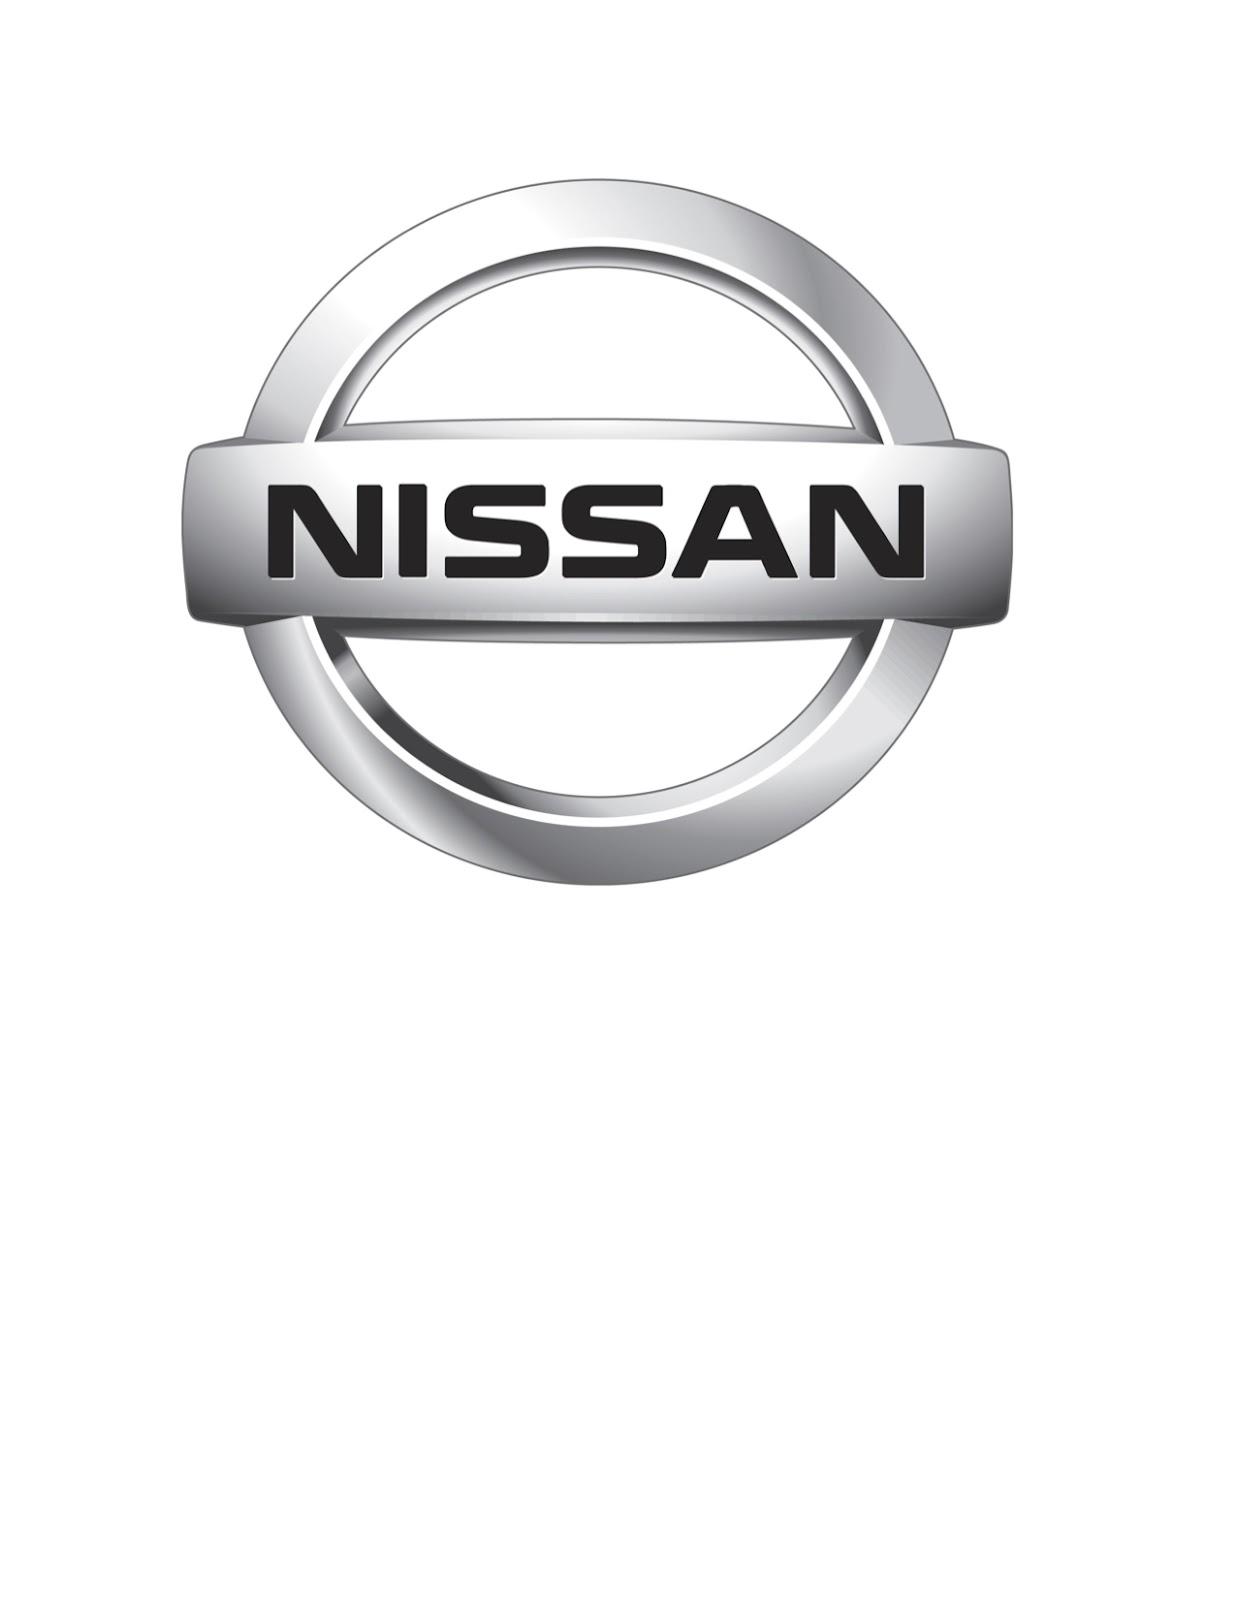 Nissan marketing plan 2011 tana o 39 boyle e portfolio for Marketing strategy of nissan motor company